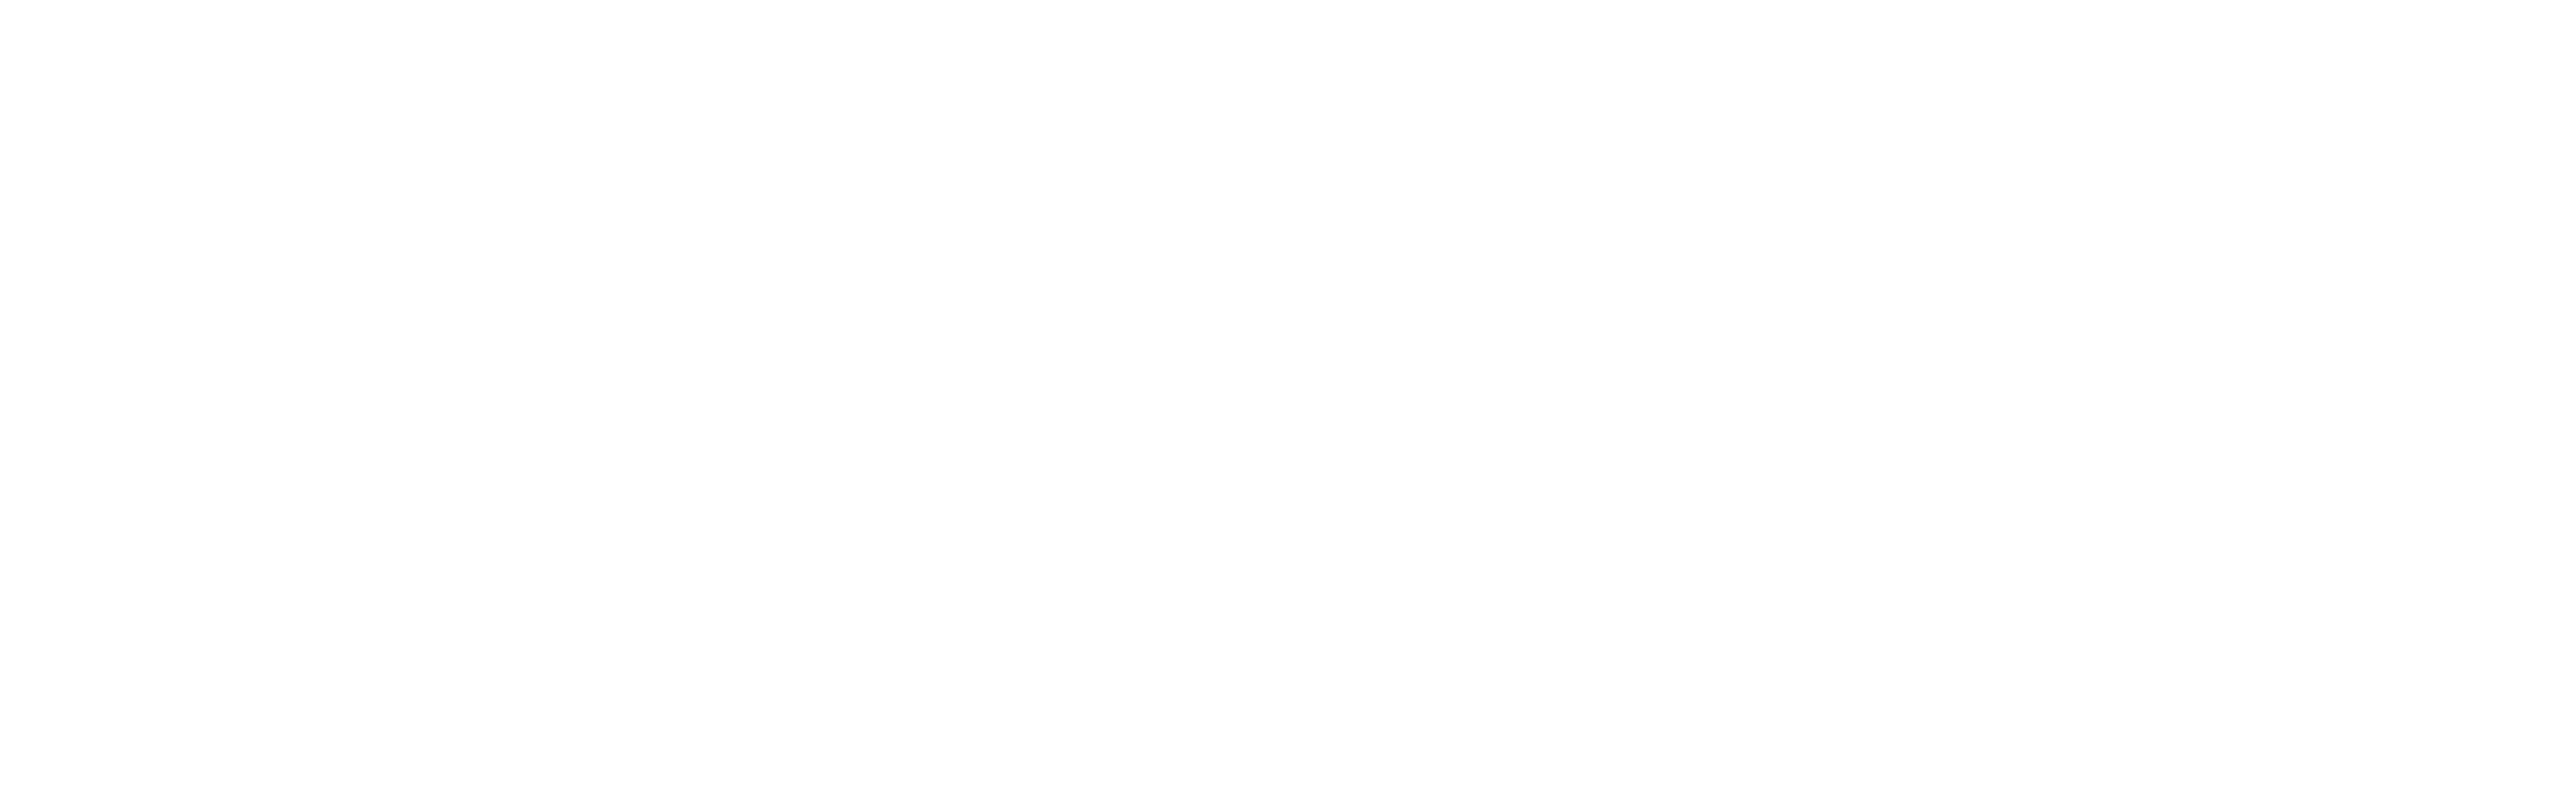 united_4p_h_w_r